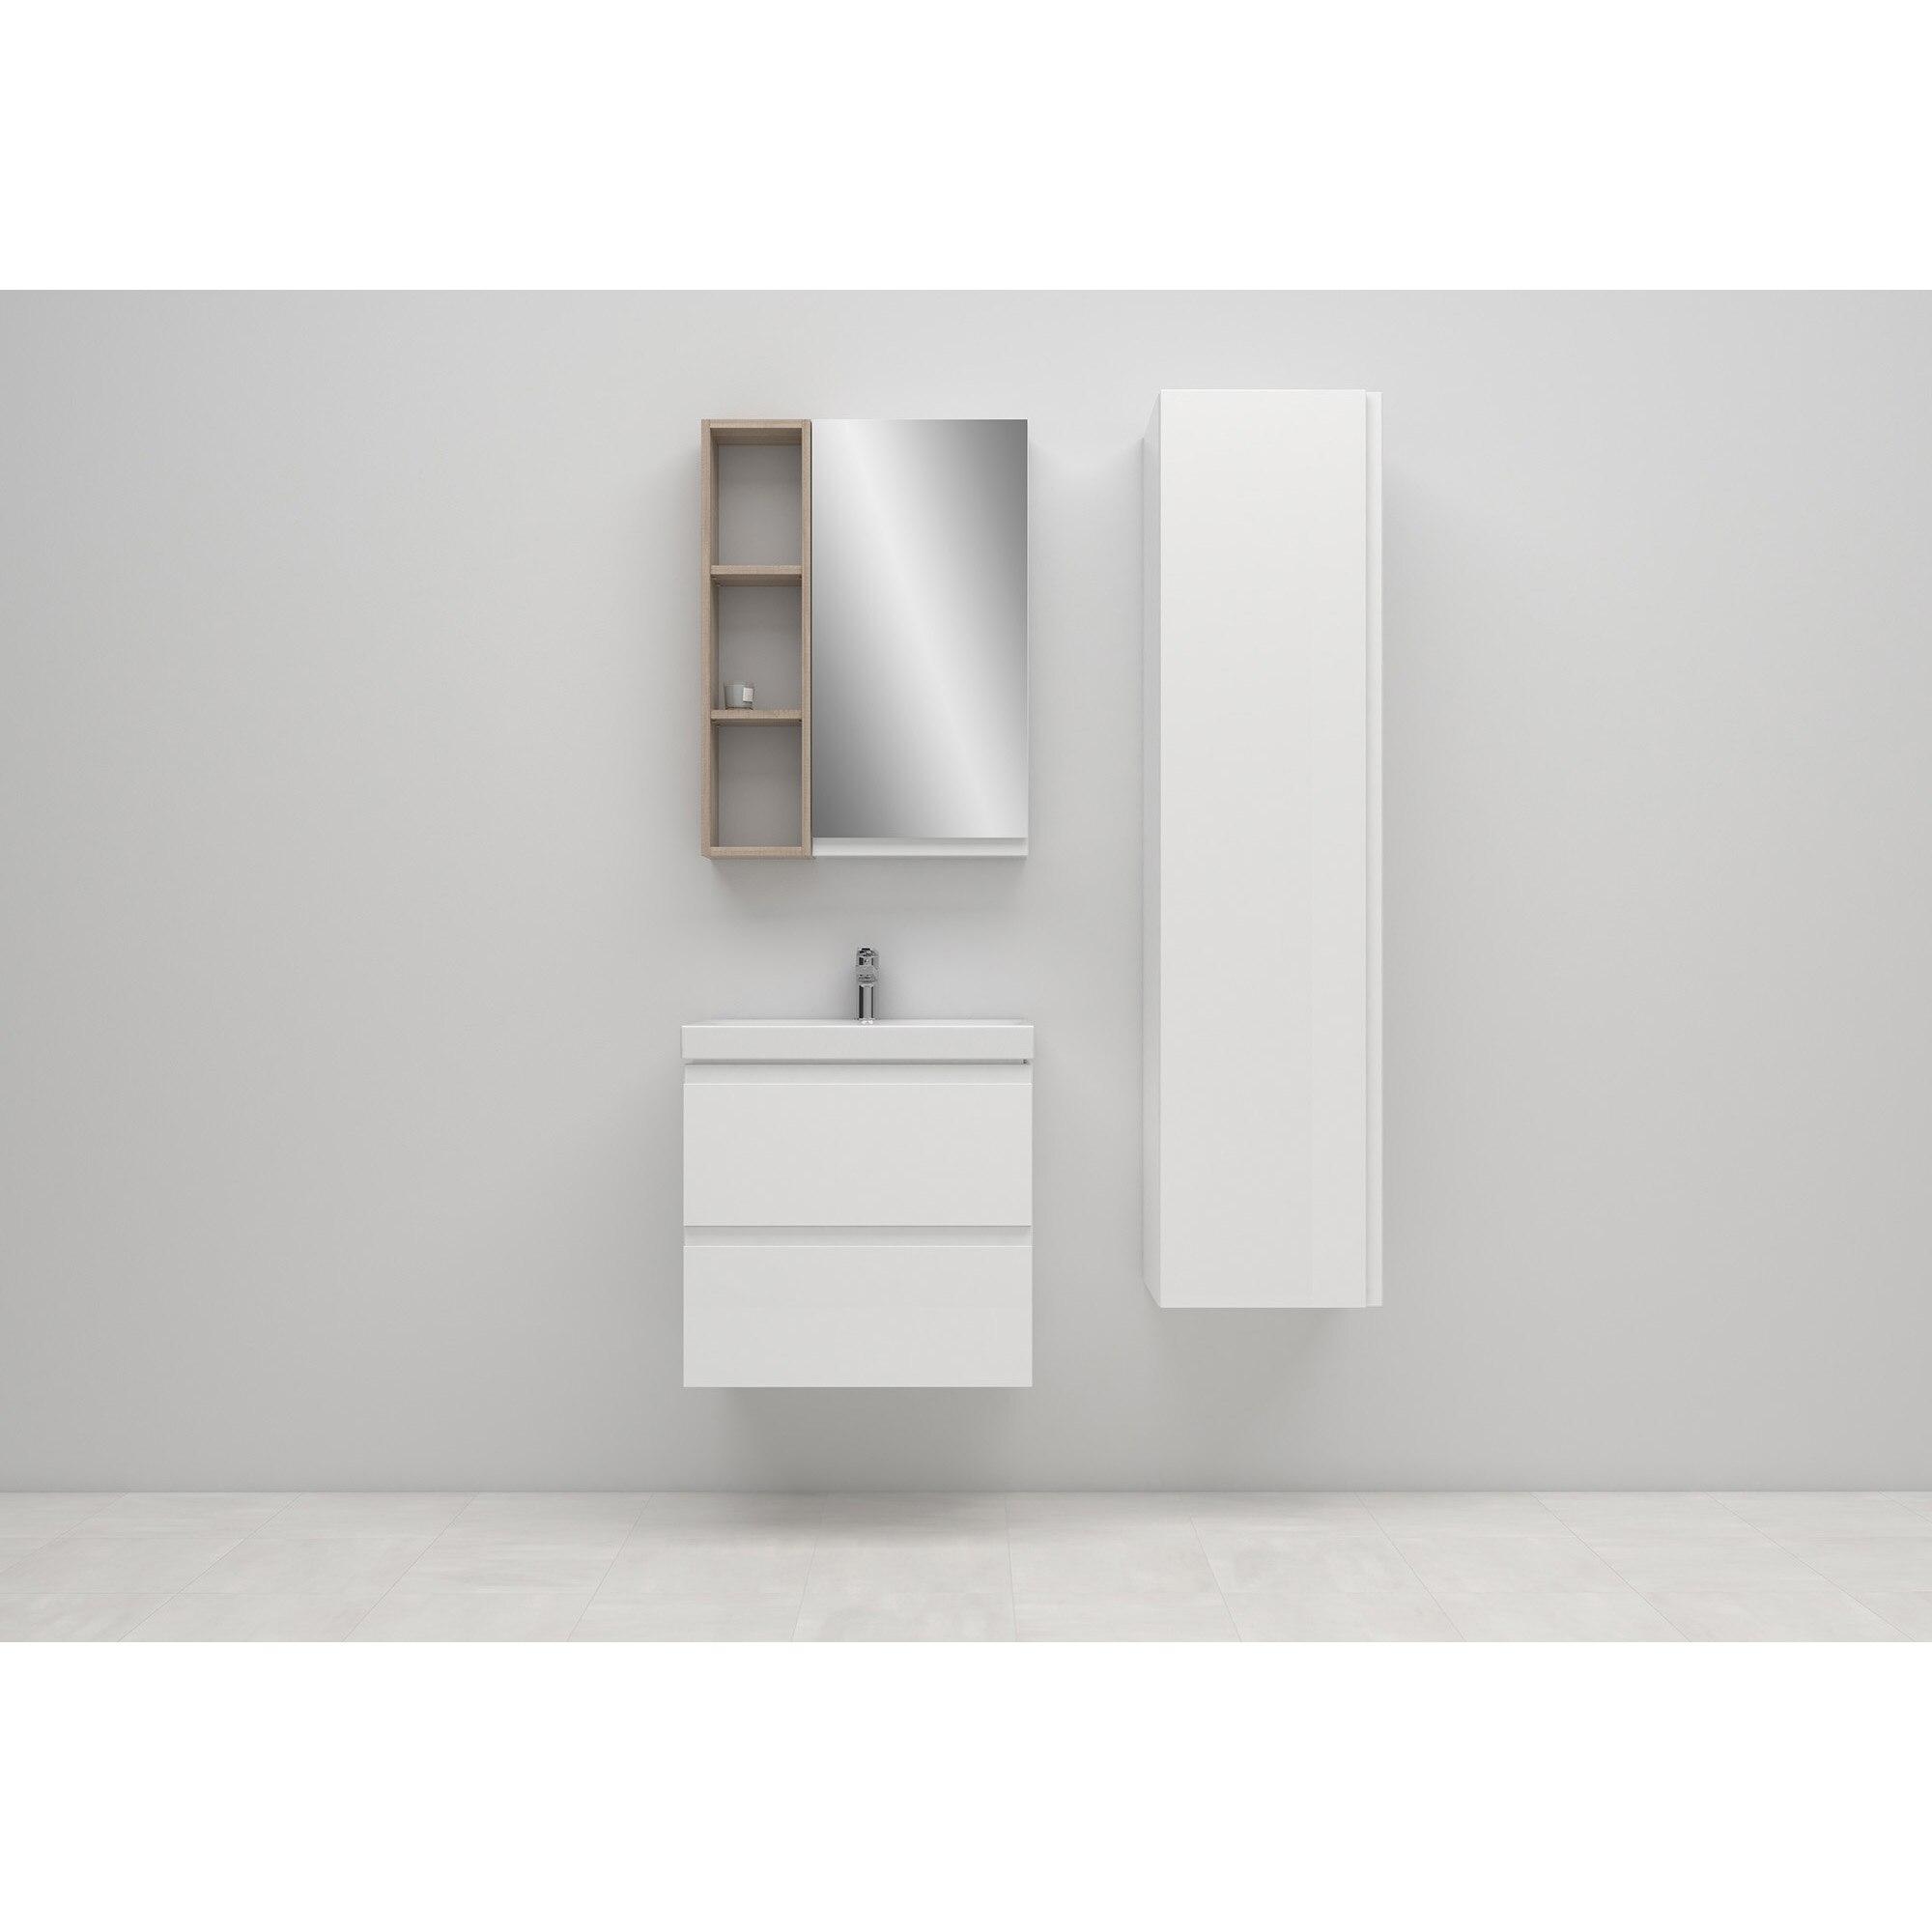 Fotografie Pachet Cersanit 981 MODUO SLIM S801-227-DSM, dulap, 2 sertare, inchidere lenta, manere ascunse + lavoar, 59.5 x 37.5 x 57 cm